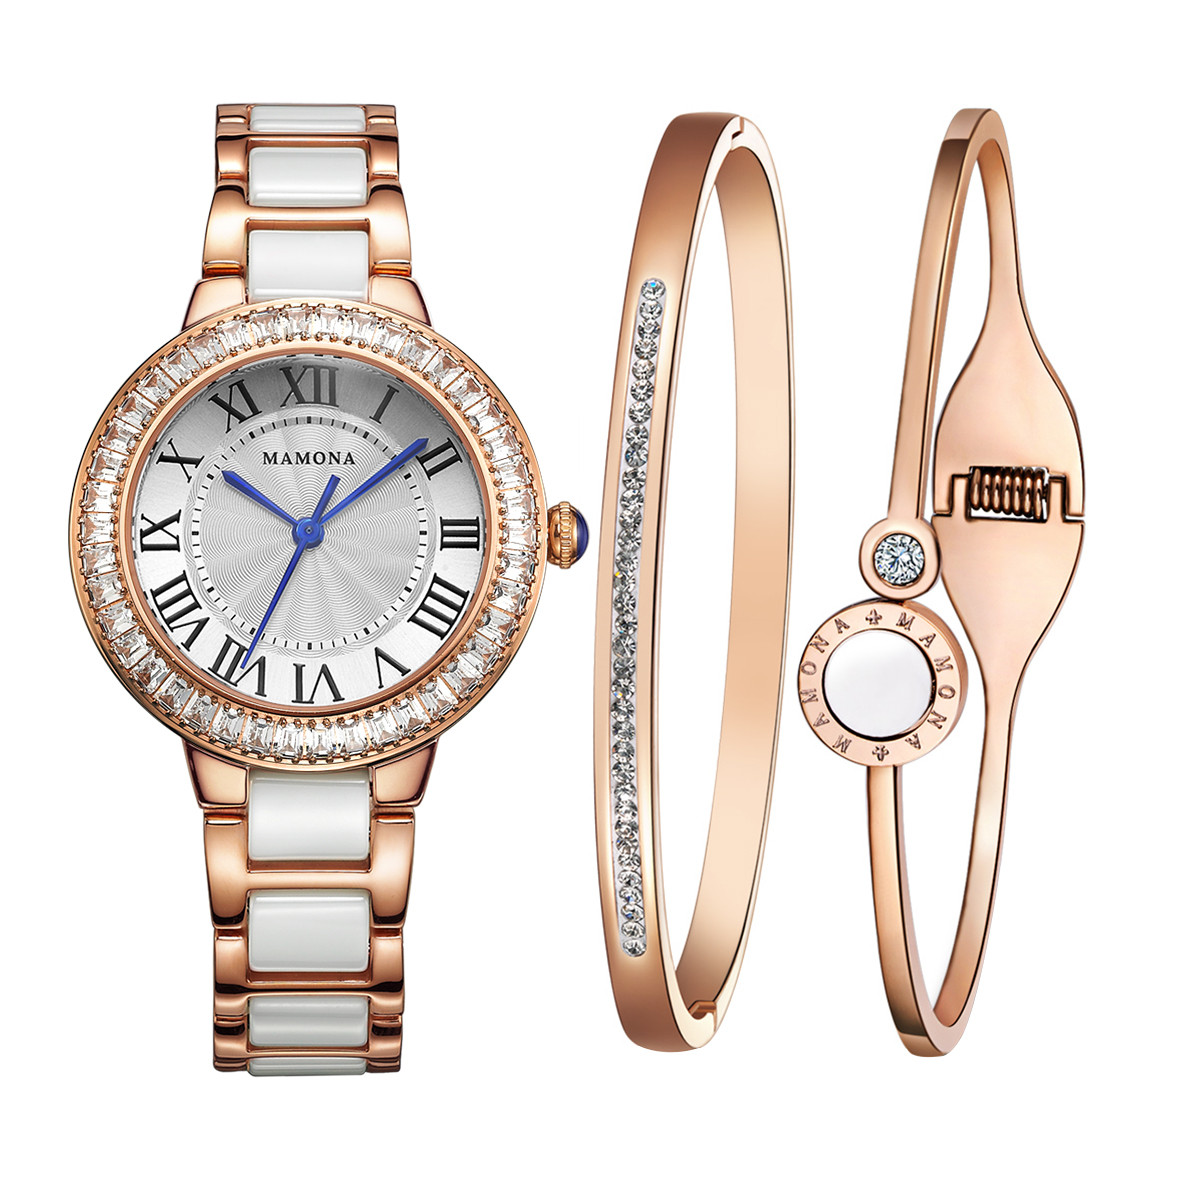 Bracelet And Watch Set  MAMONA Women s Watch Bracelet Gift Set L RGGT MAMONA